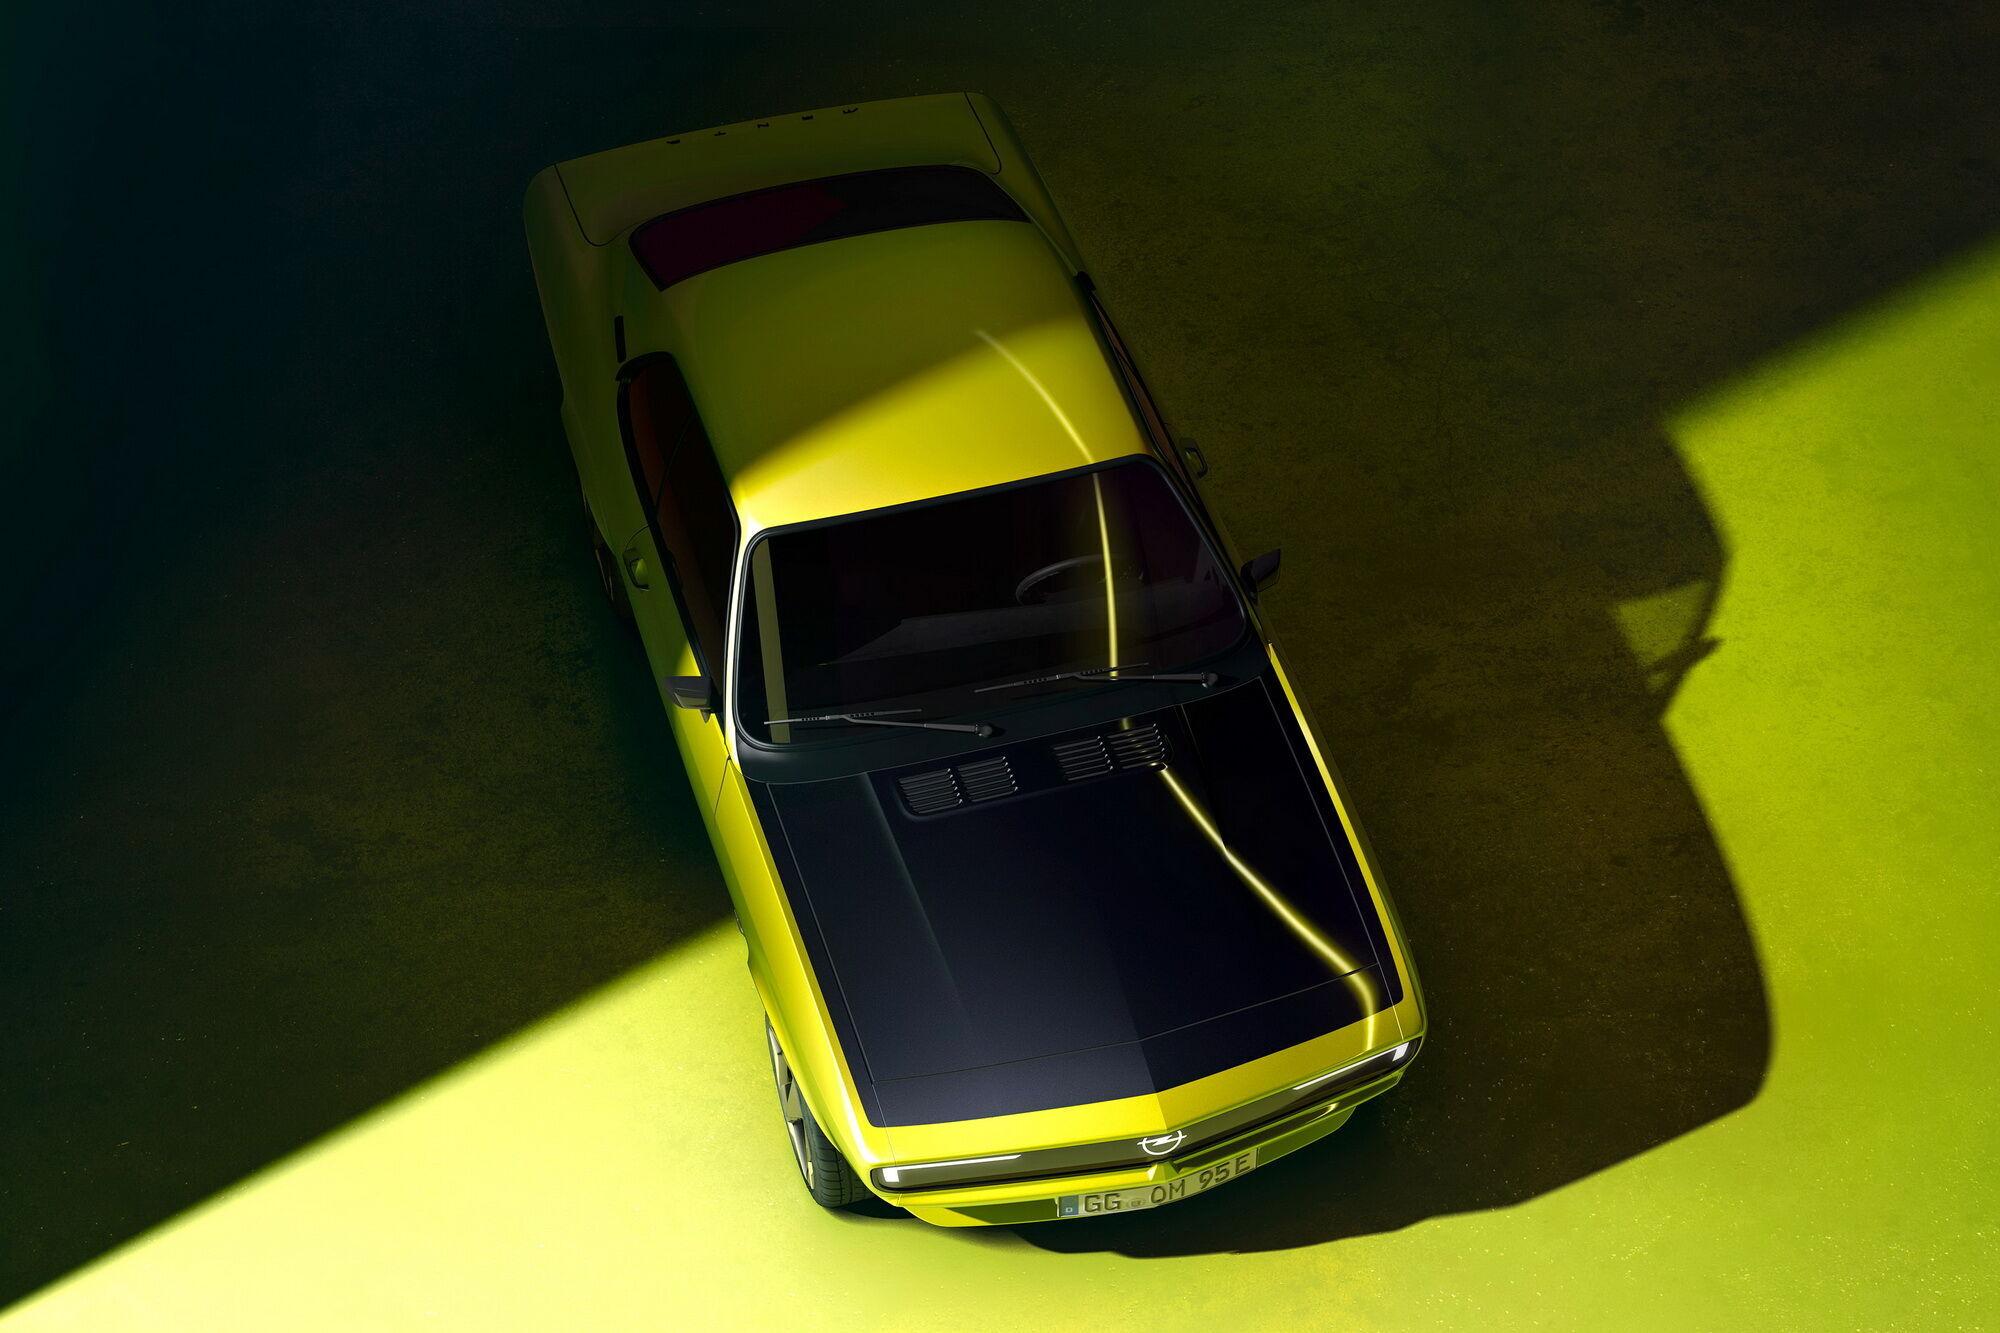 Opel представила проект рестомода на базі легендарної моделі Opel Manta